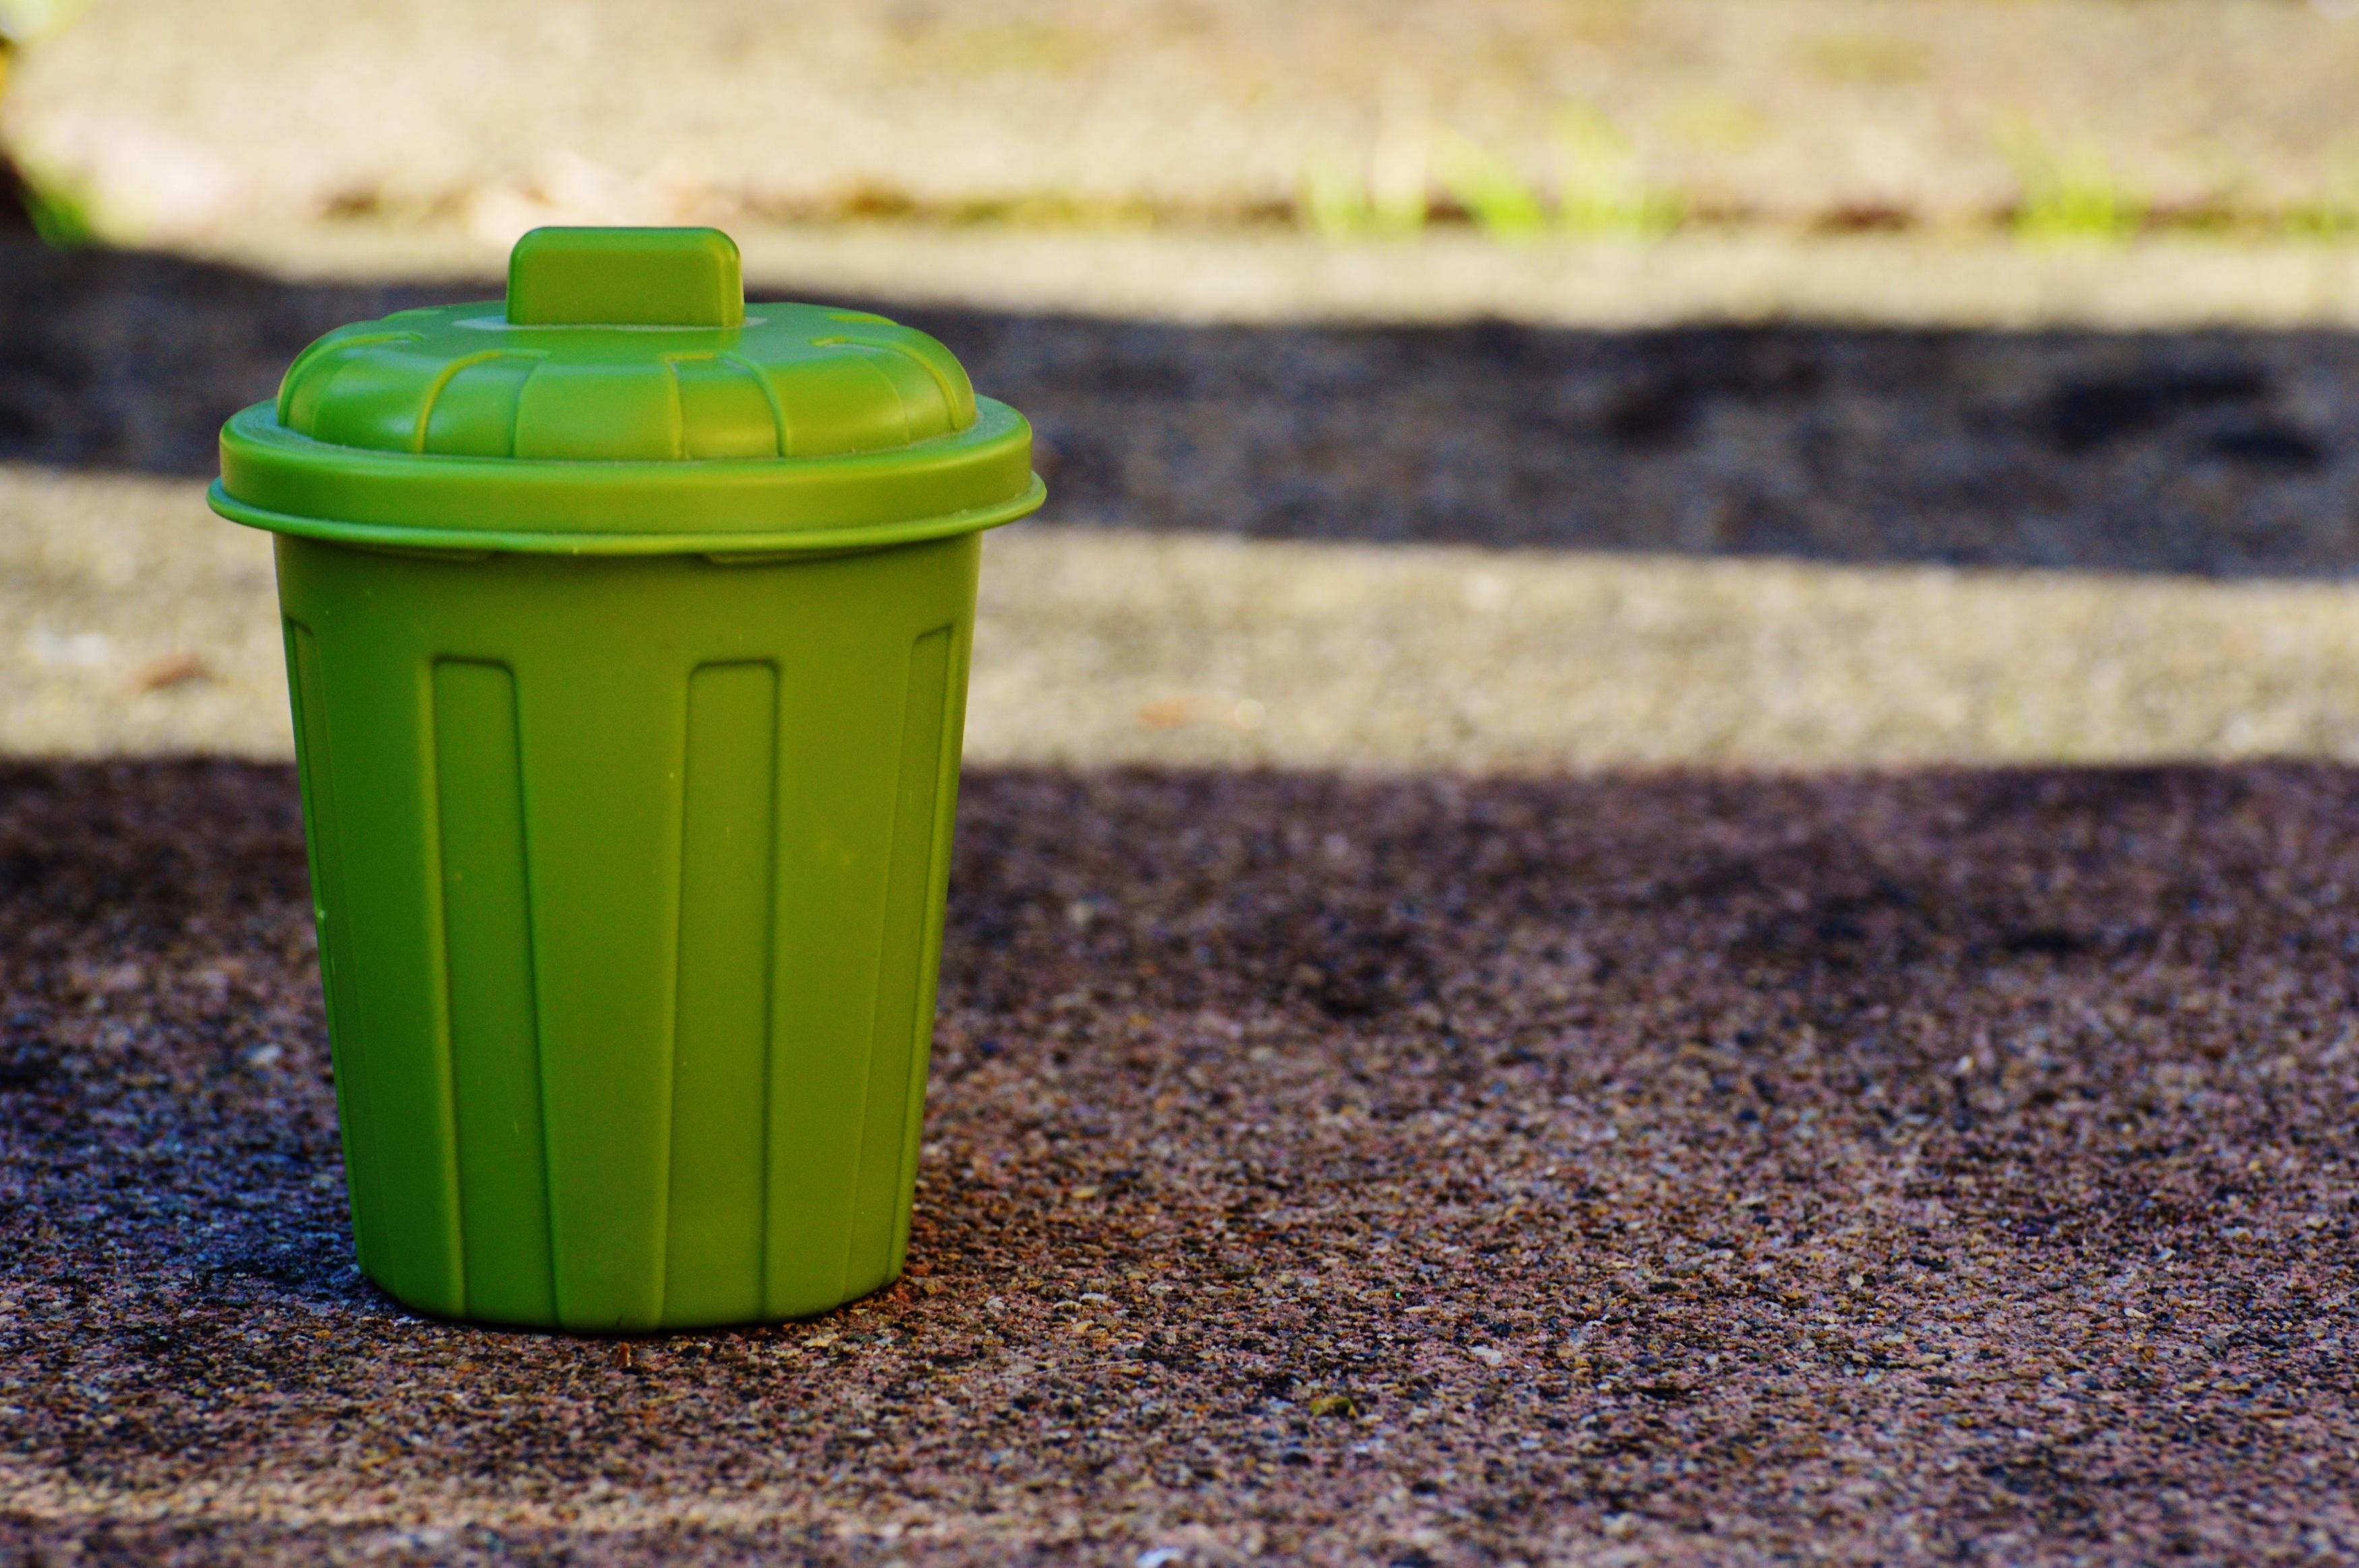 Rumput Halaman Daun Bunga Hijau Warna Tanah Kuning Penerangan Ember Wadah Limbah Sampah Ton